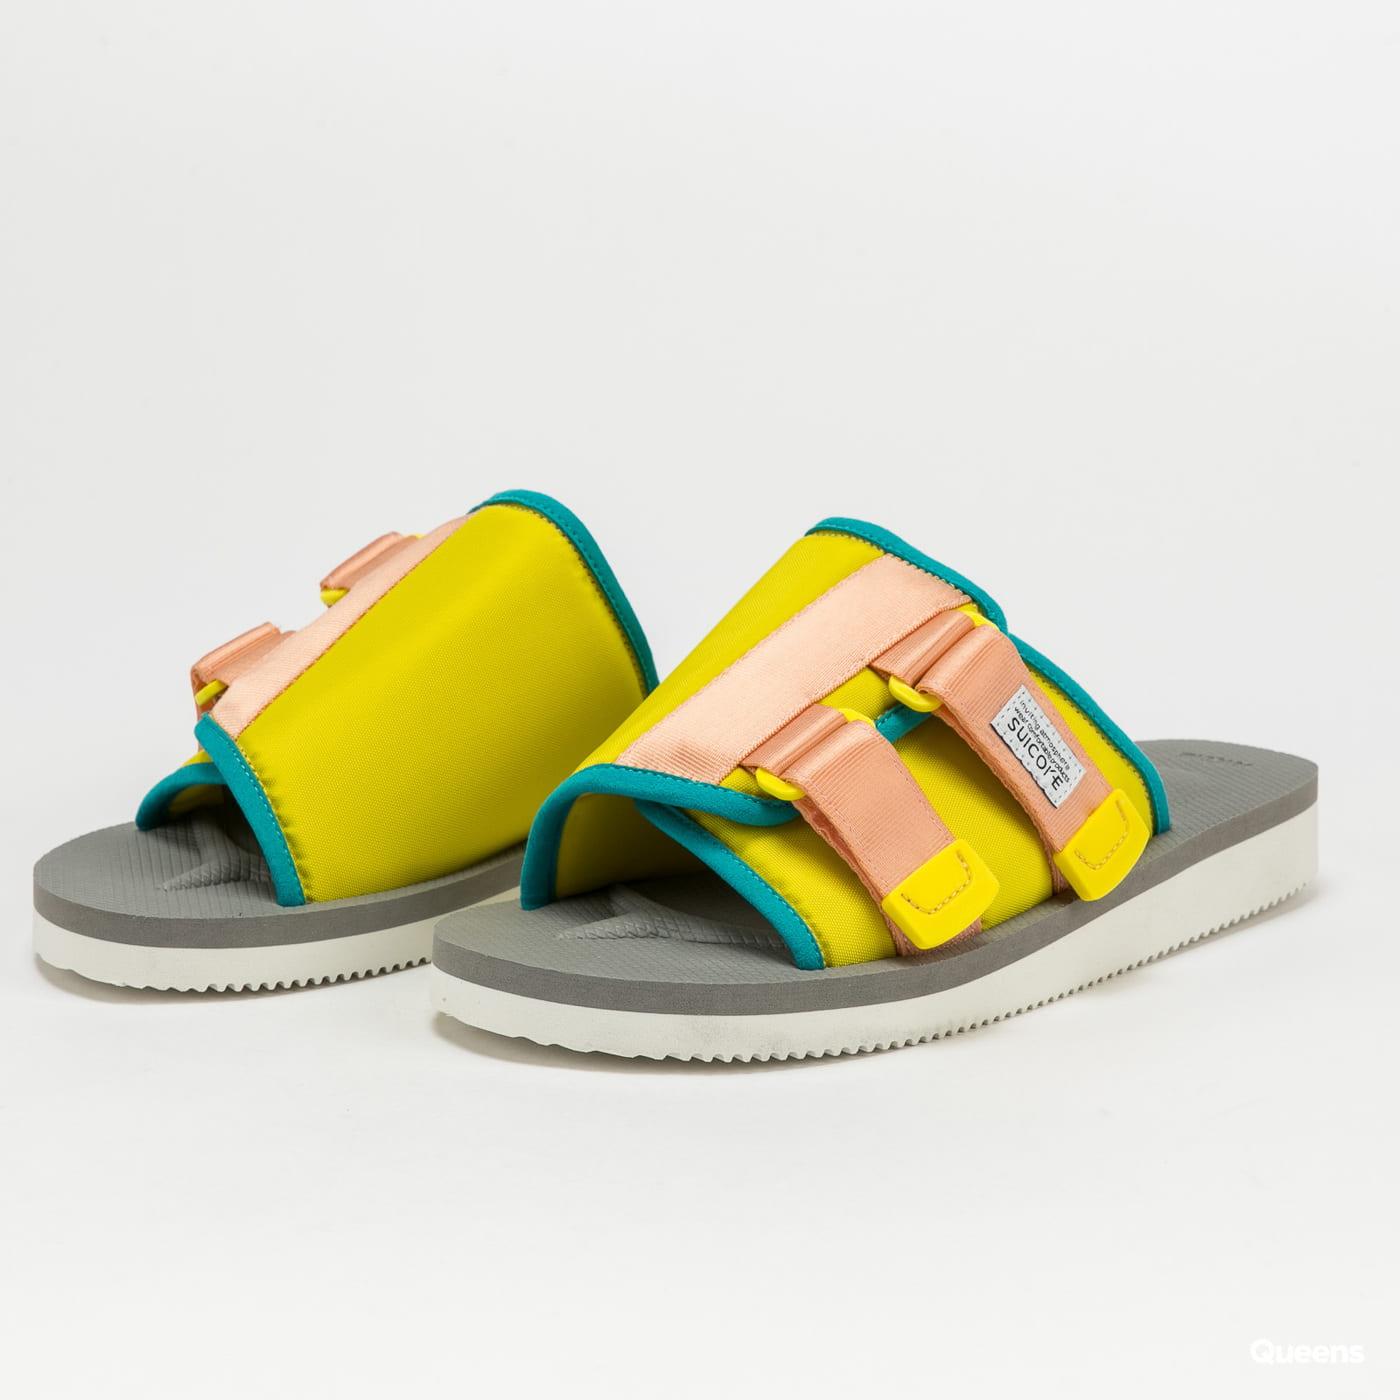 SUICOKE KAW-Cab yellow / gray